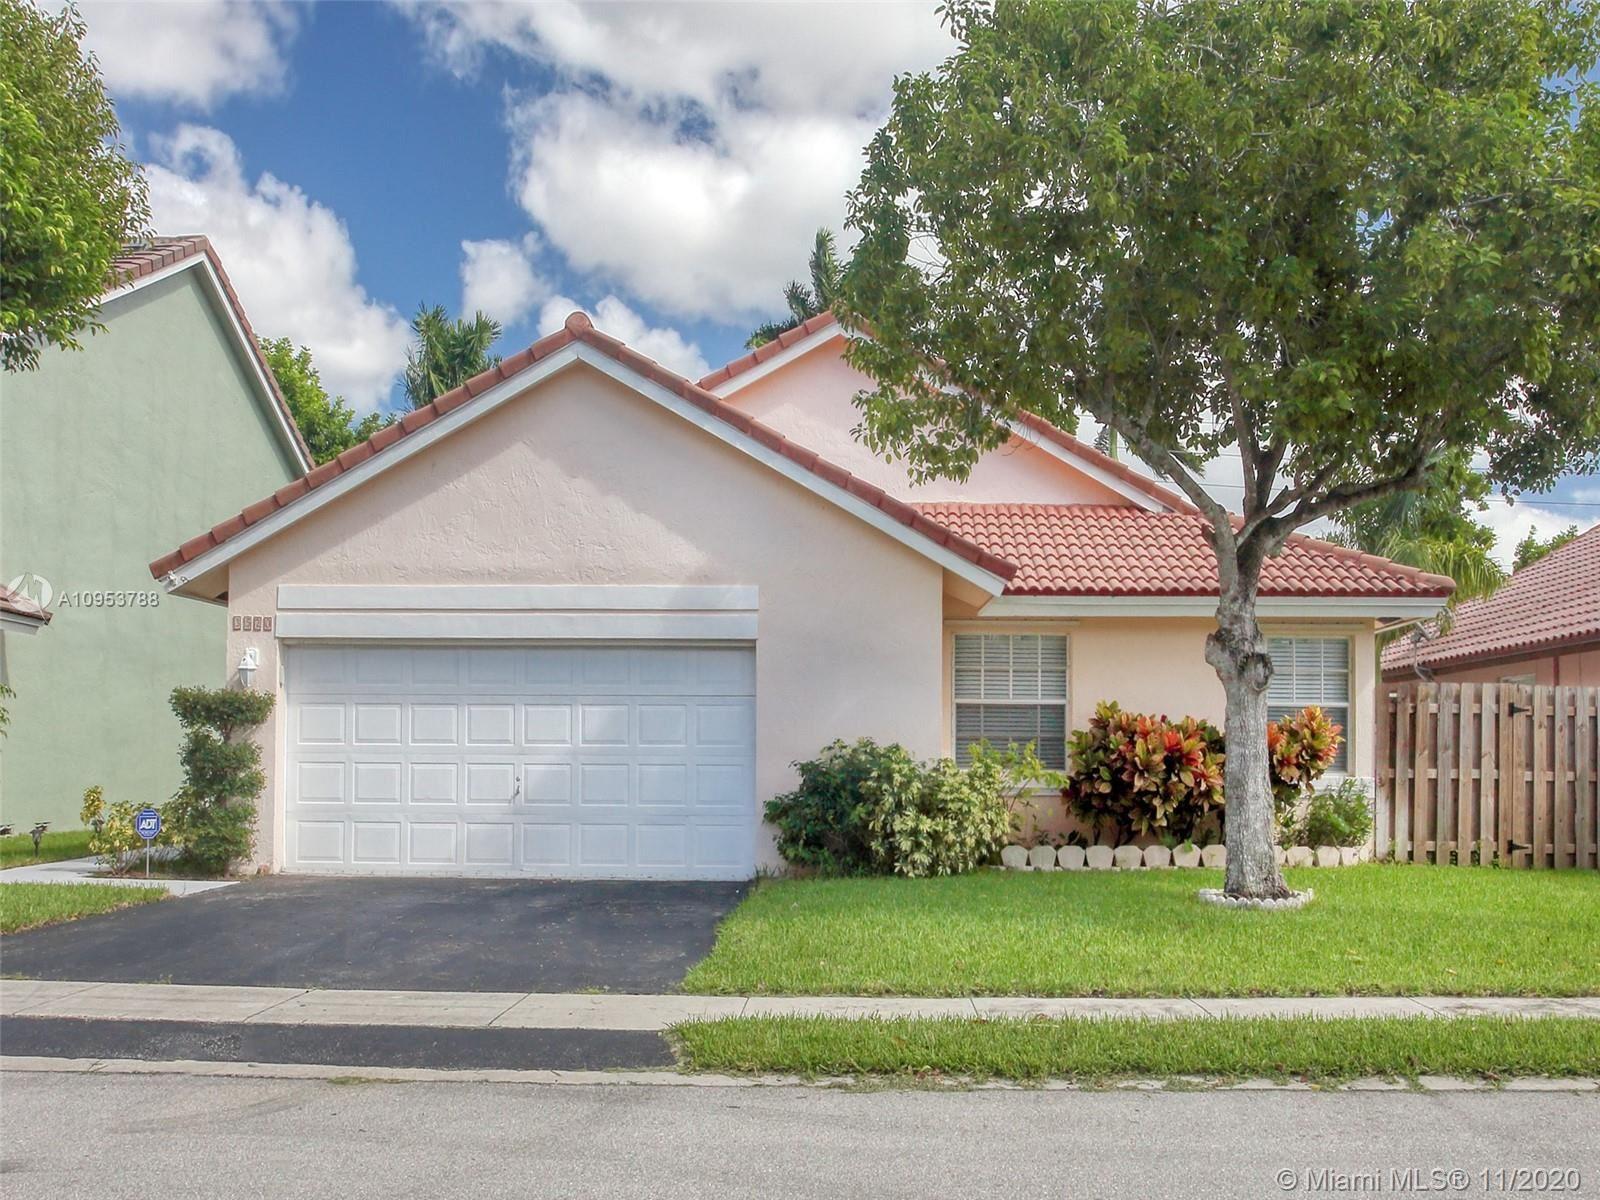 3520 NW 121st Ave, Sunrise, FL 33323 - #: A10953788